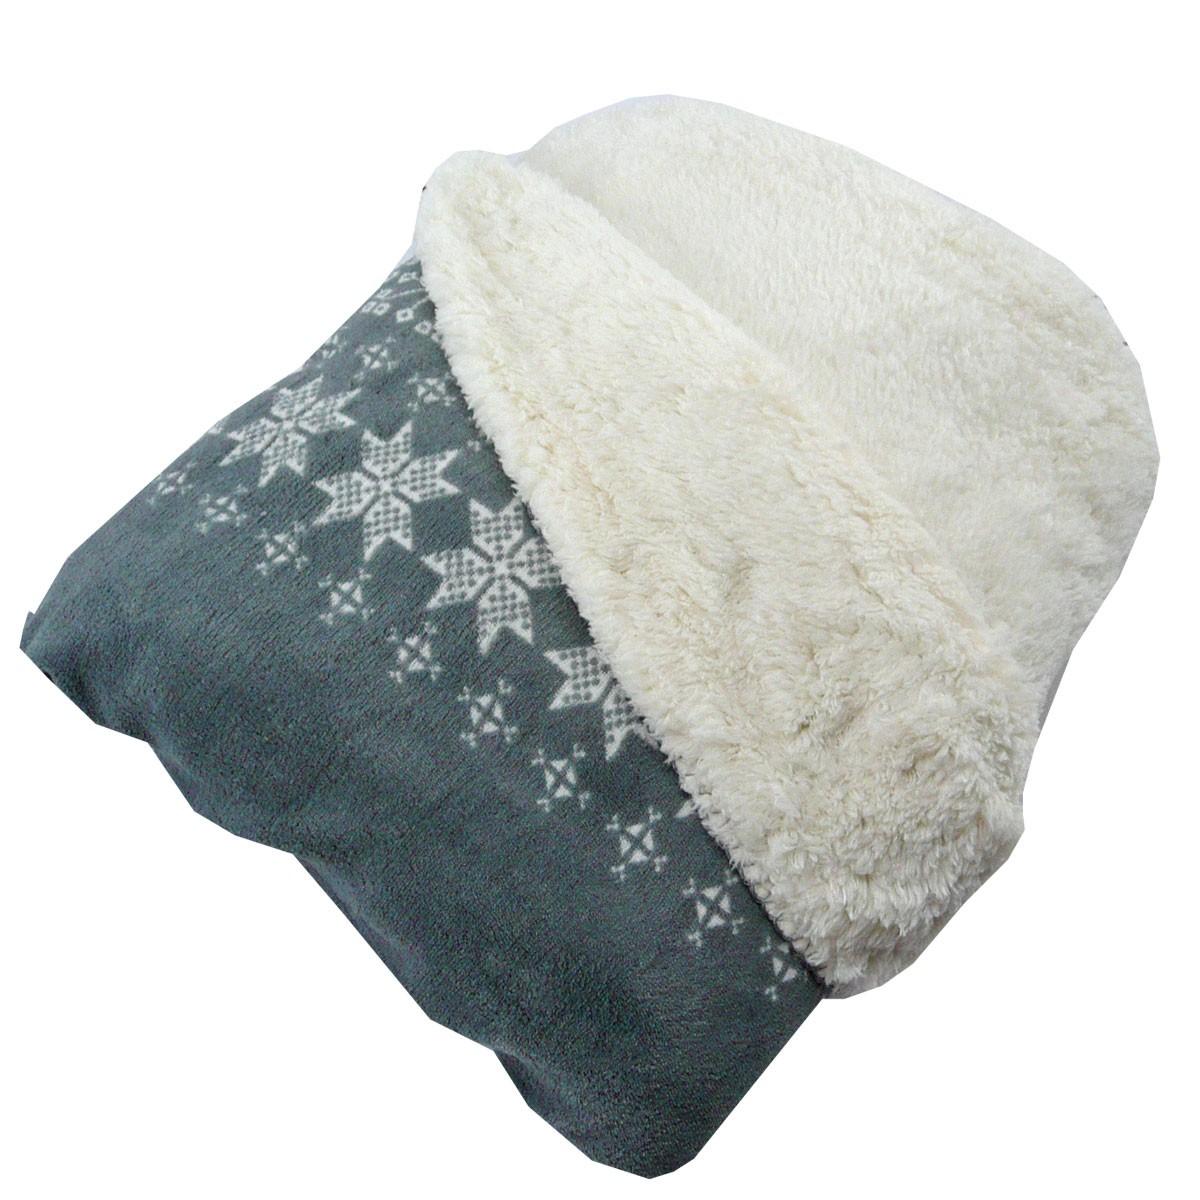 wohndecke mikrofaserdecke kuscheldecke plaid snowflake grau 130x160cm ebay. Black Bedroom Furniture Sets. Home Design Ideas